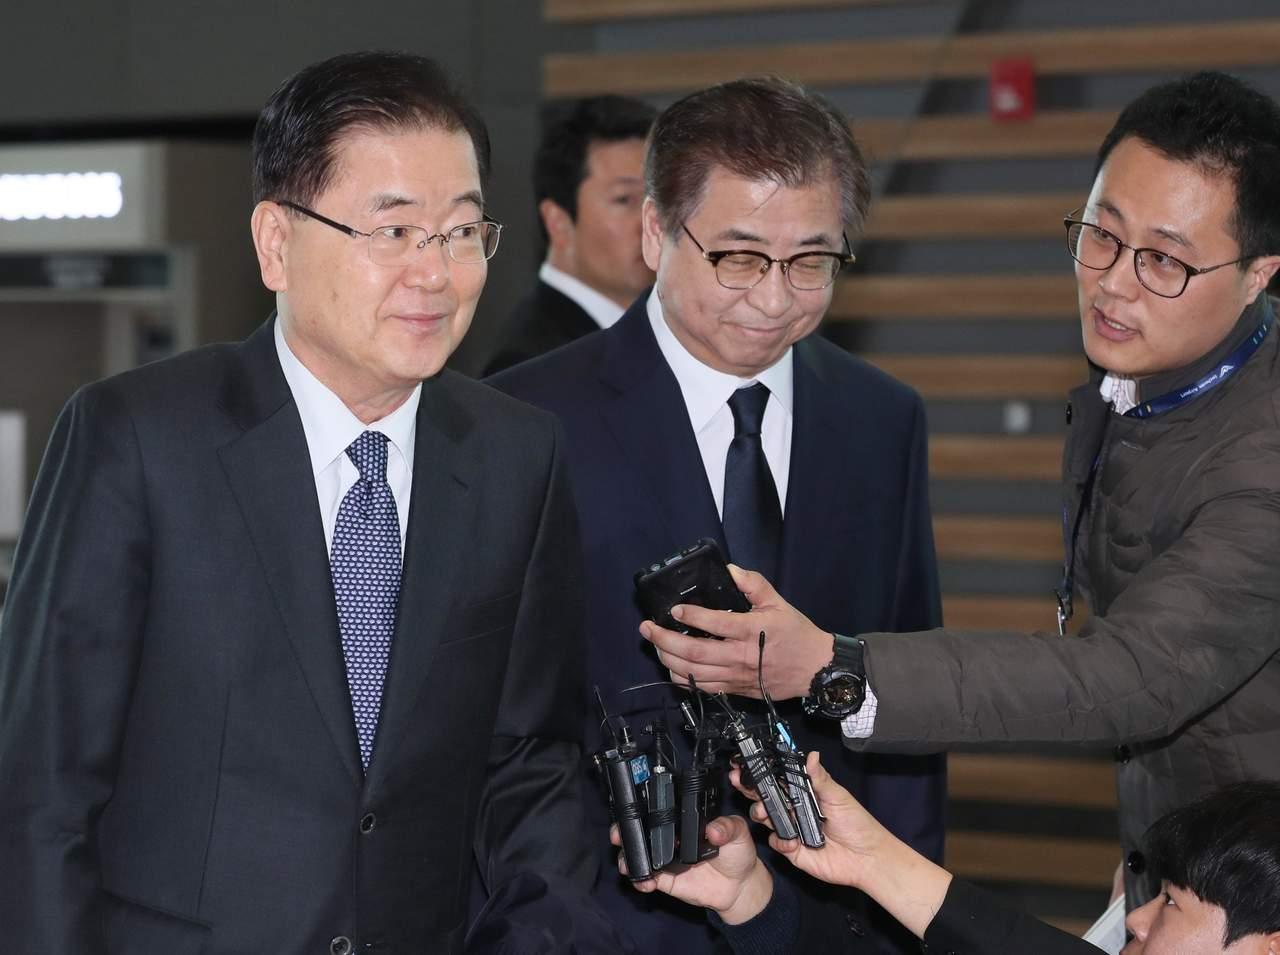 Recibe Casa Blanca delegación surcoreana que trae mensaje de Kim Jong-un